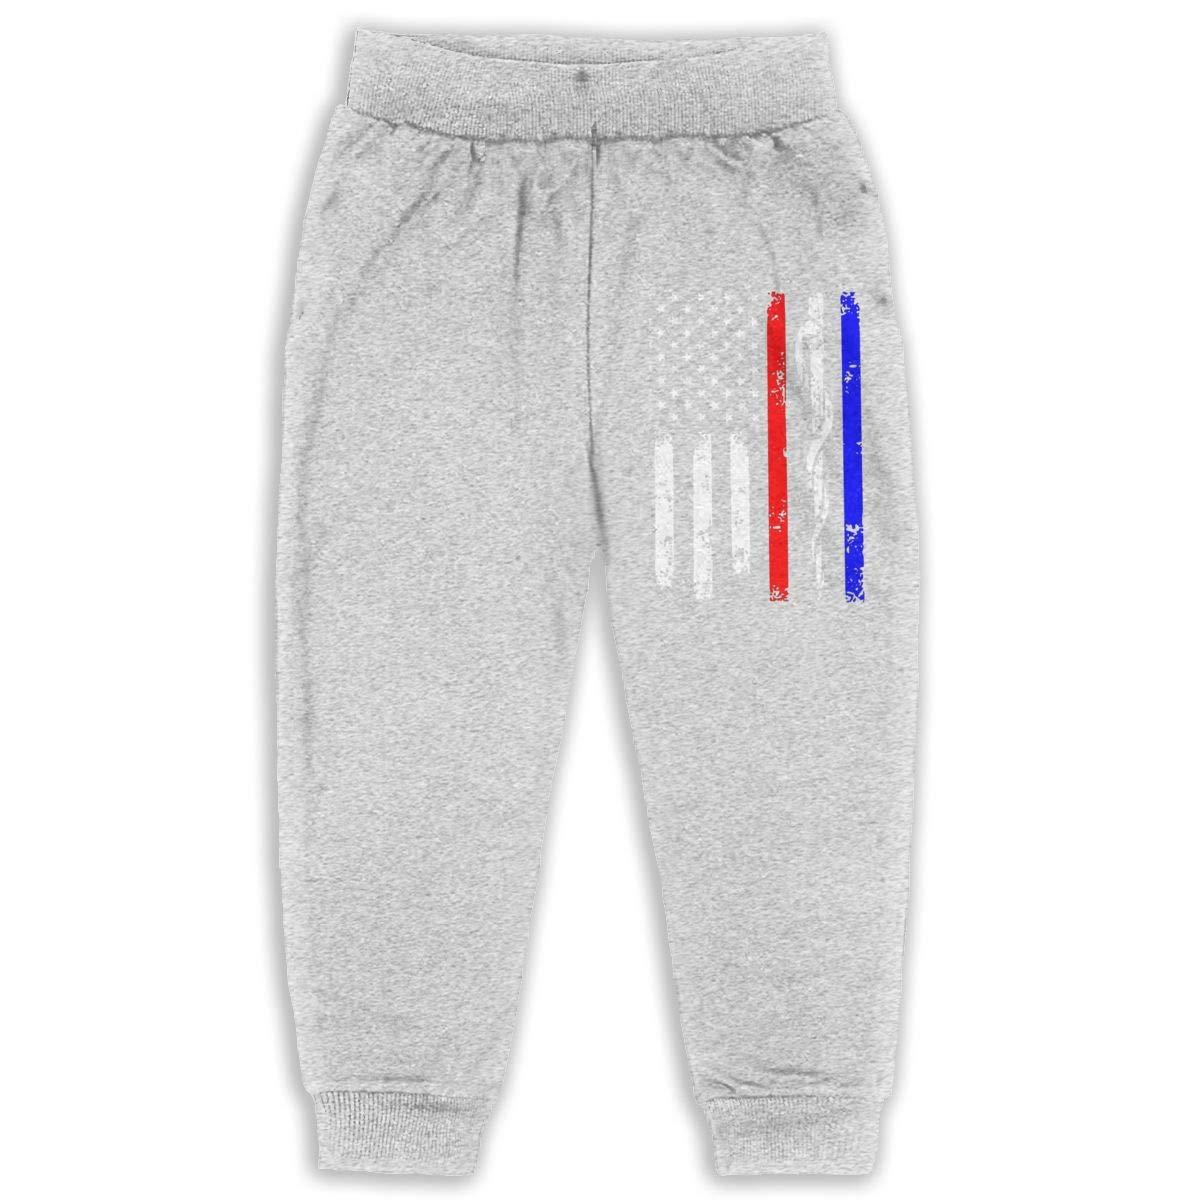 Laoyaotequ Police /& Firefighter /& EMT Flag Kids Cotton Sweatpants,Jogger Long Jersey Sweatpants